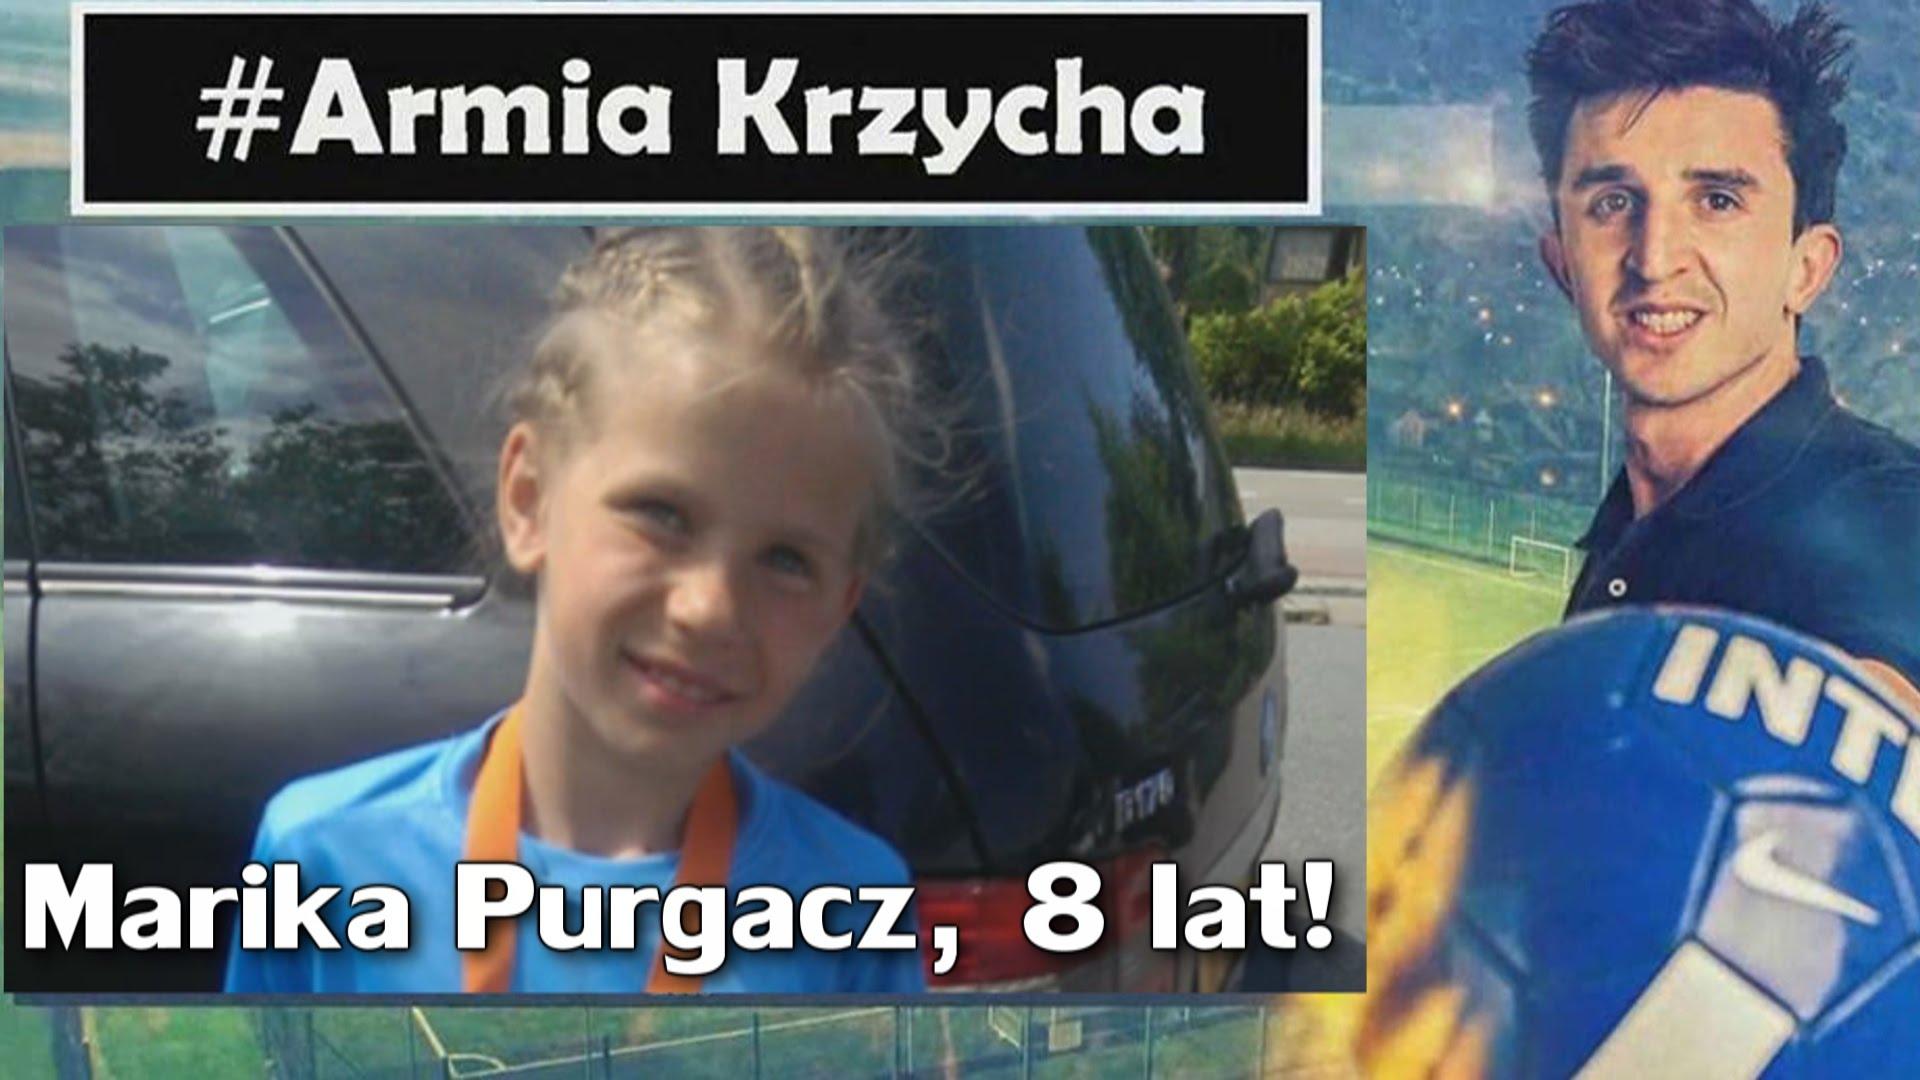 #ArmiaKrzycha: Marika Purgacz, 8 lat!